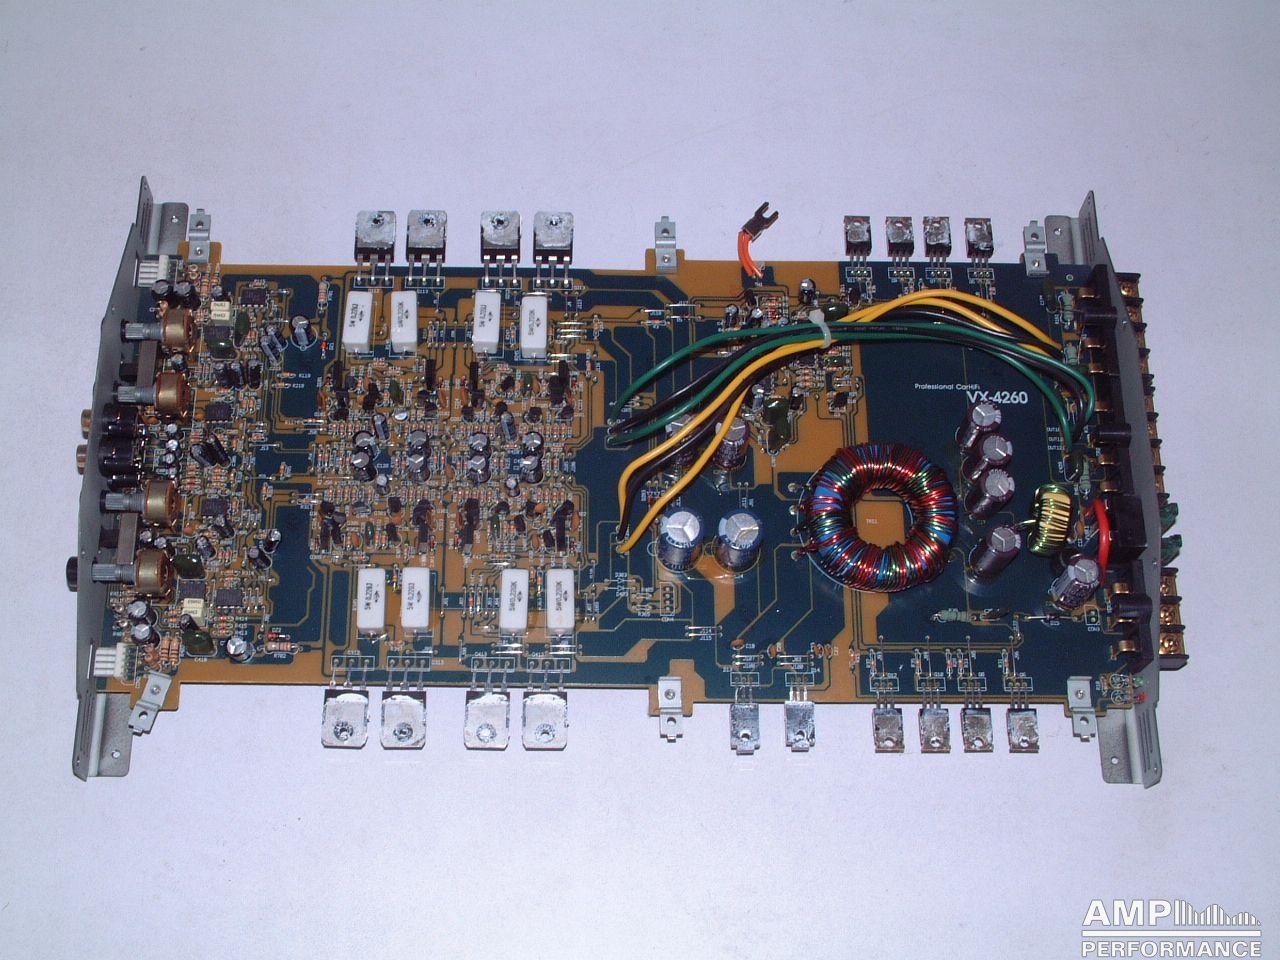 Weconic VX-4270 - AMP-Performance